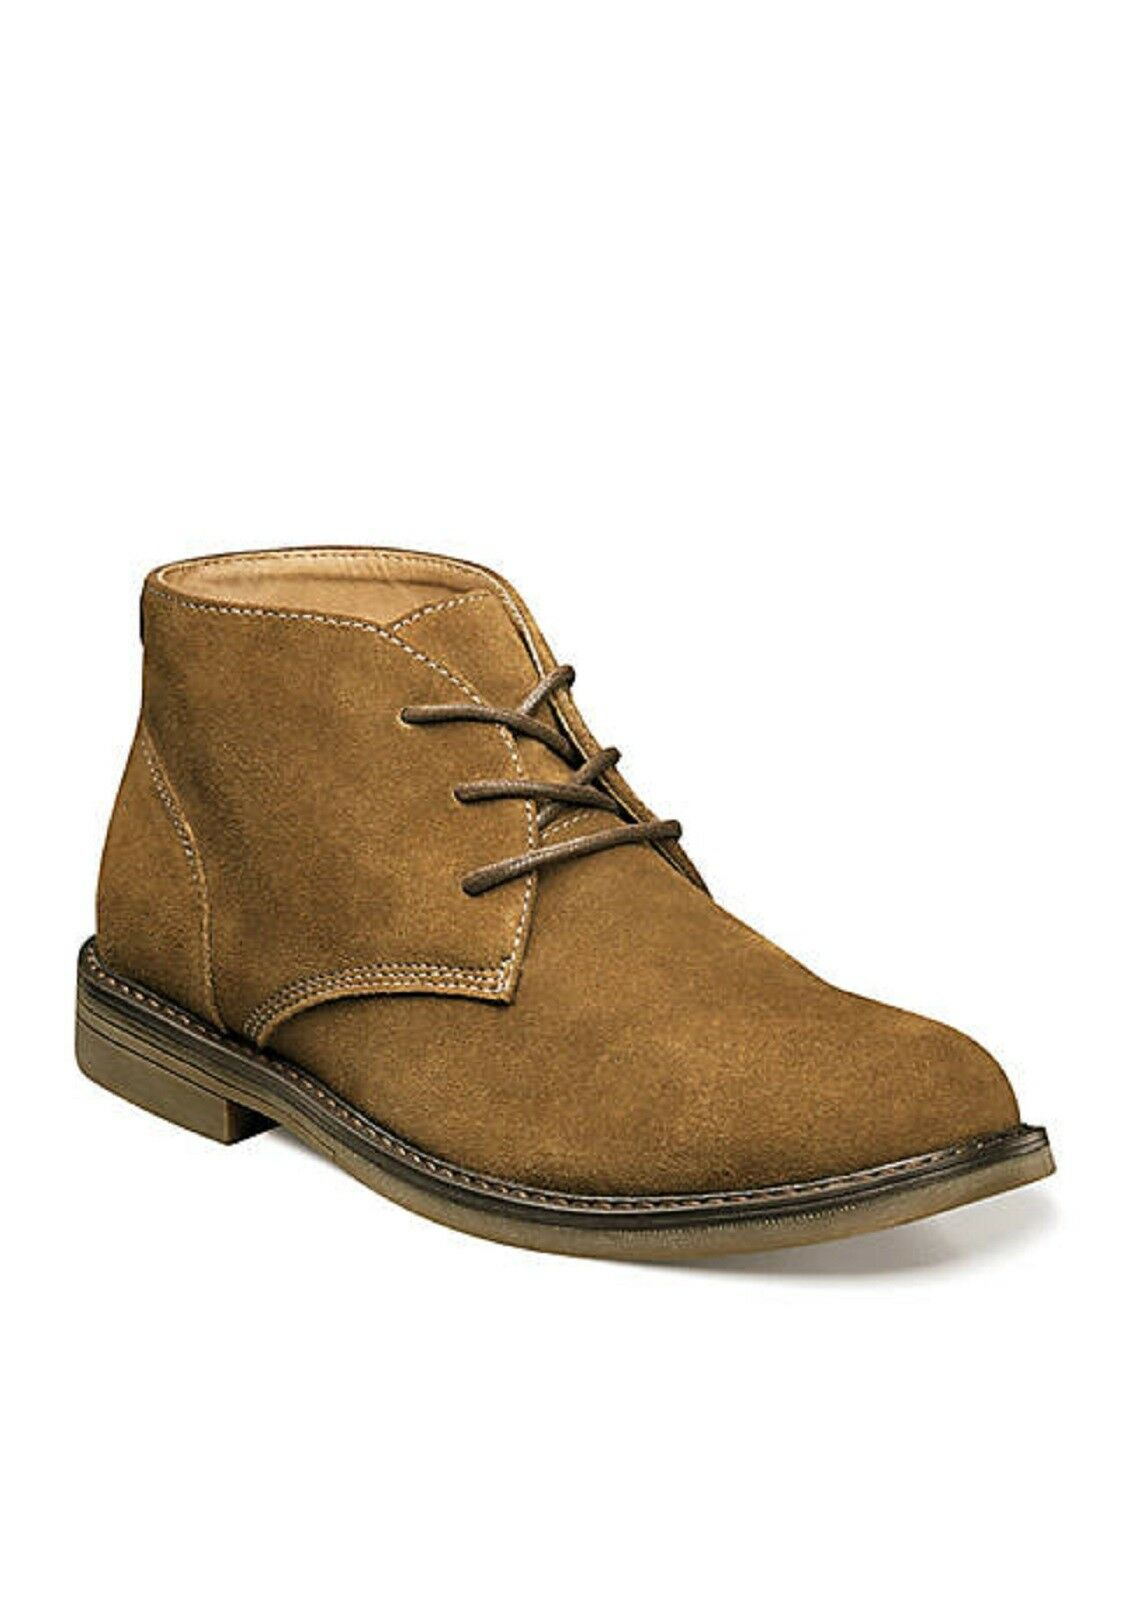 NUNN BUSH Men's 'Lancaster' Camel Suede Chukka Boots Sz. 10.5 M  NIB